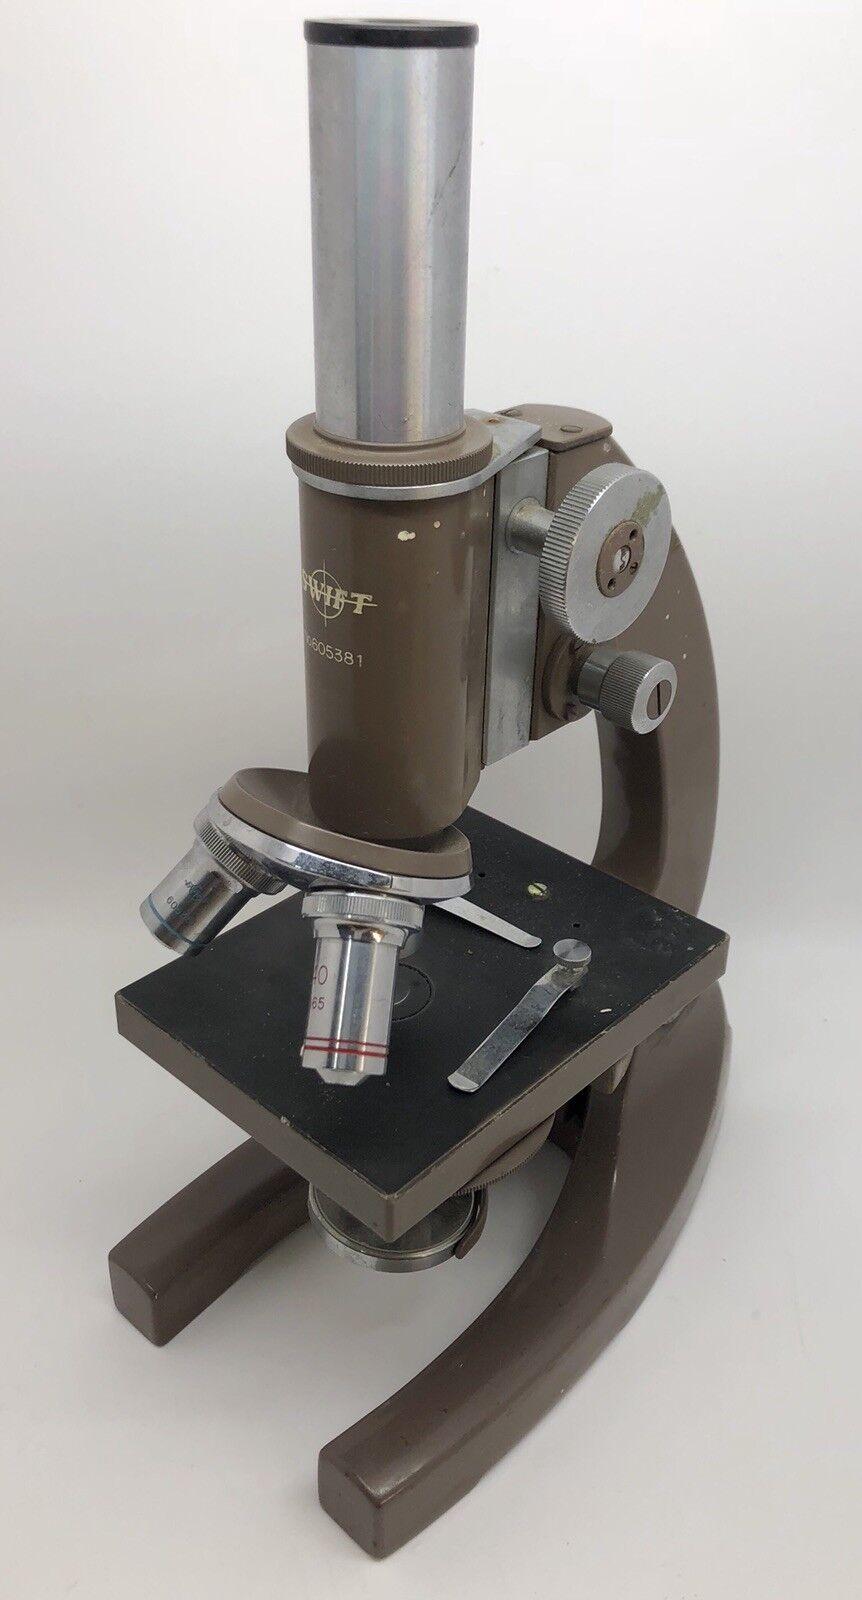 Vintage - swift. 605381 student mikroskop 4x 10x 40x... wie (rf897)